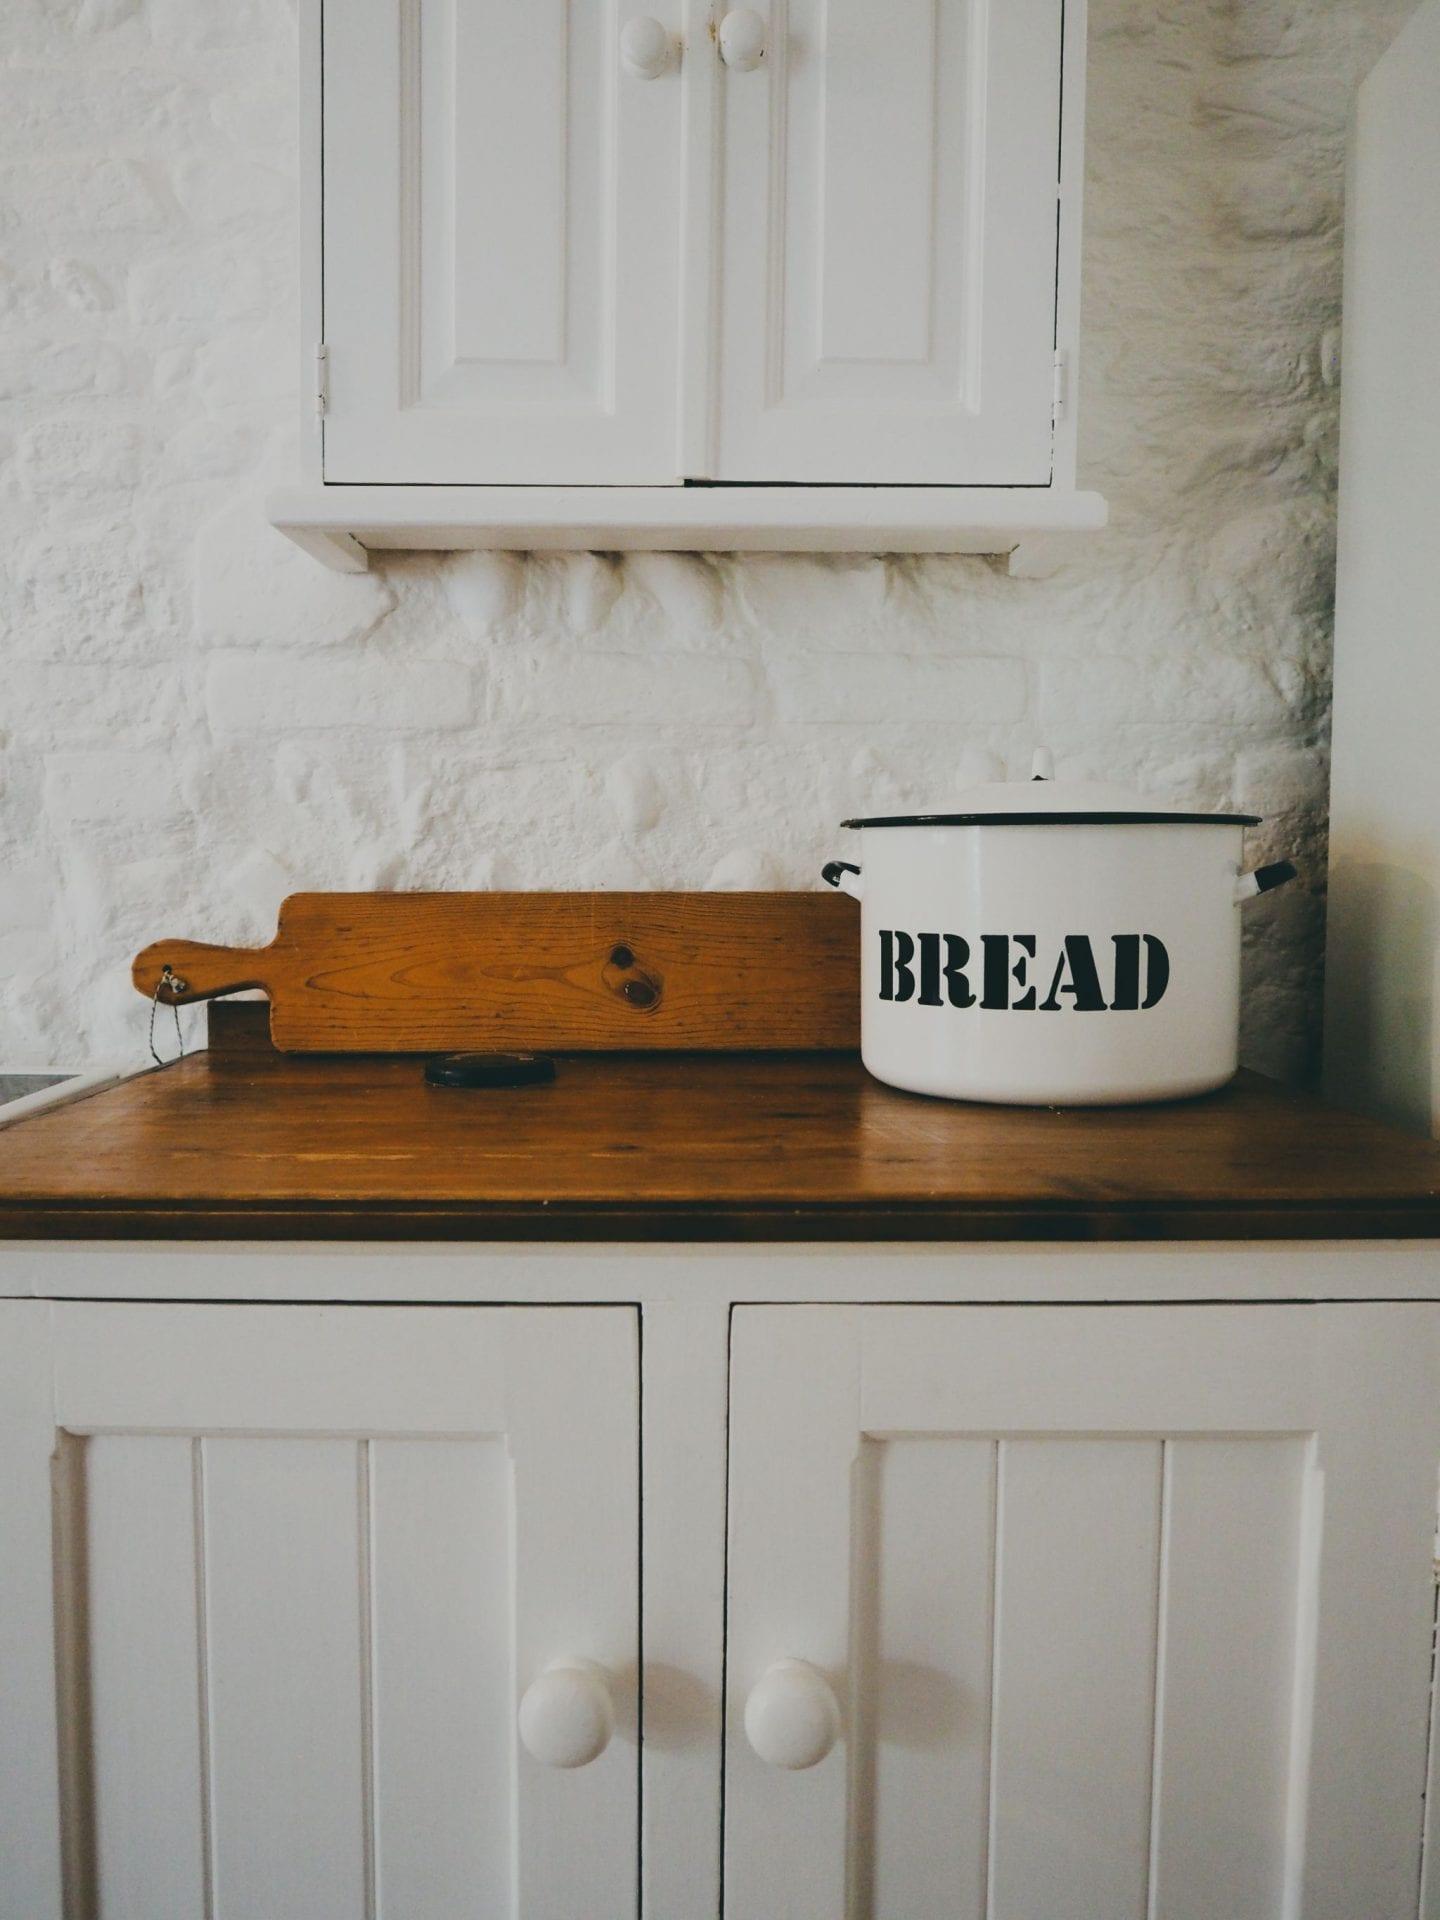 english country kitchen beautiful kitchen plates bread bin country kitchen ideas